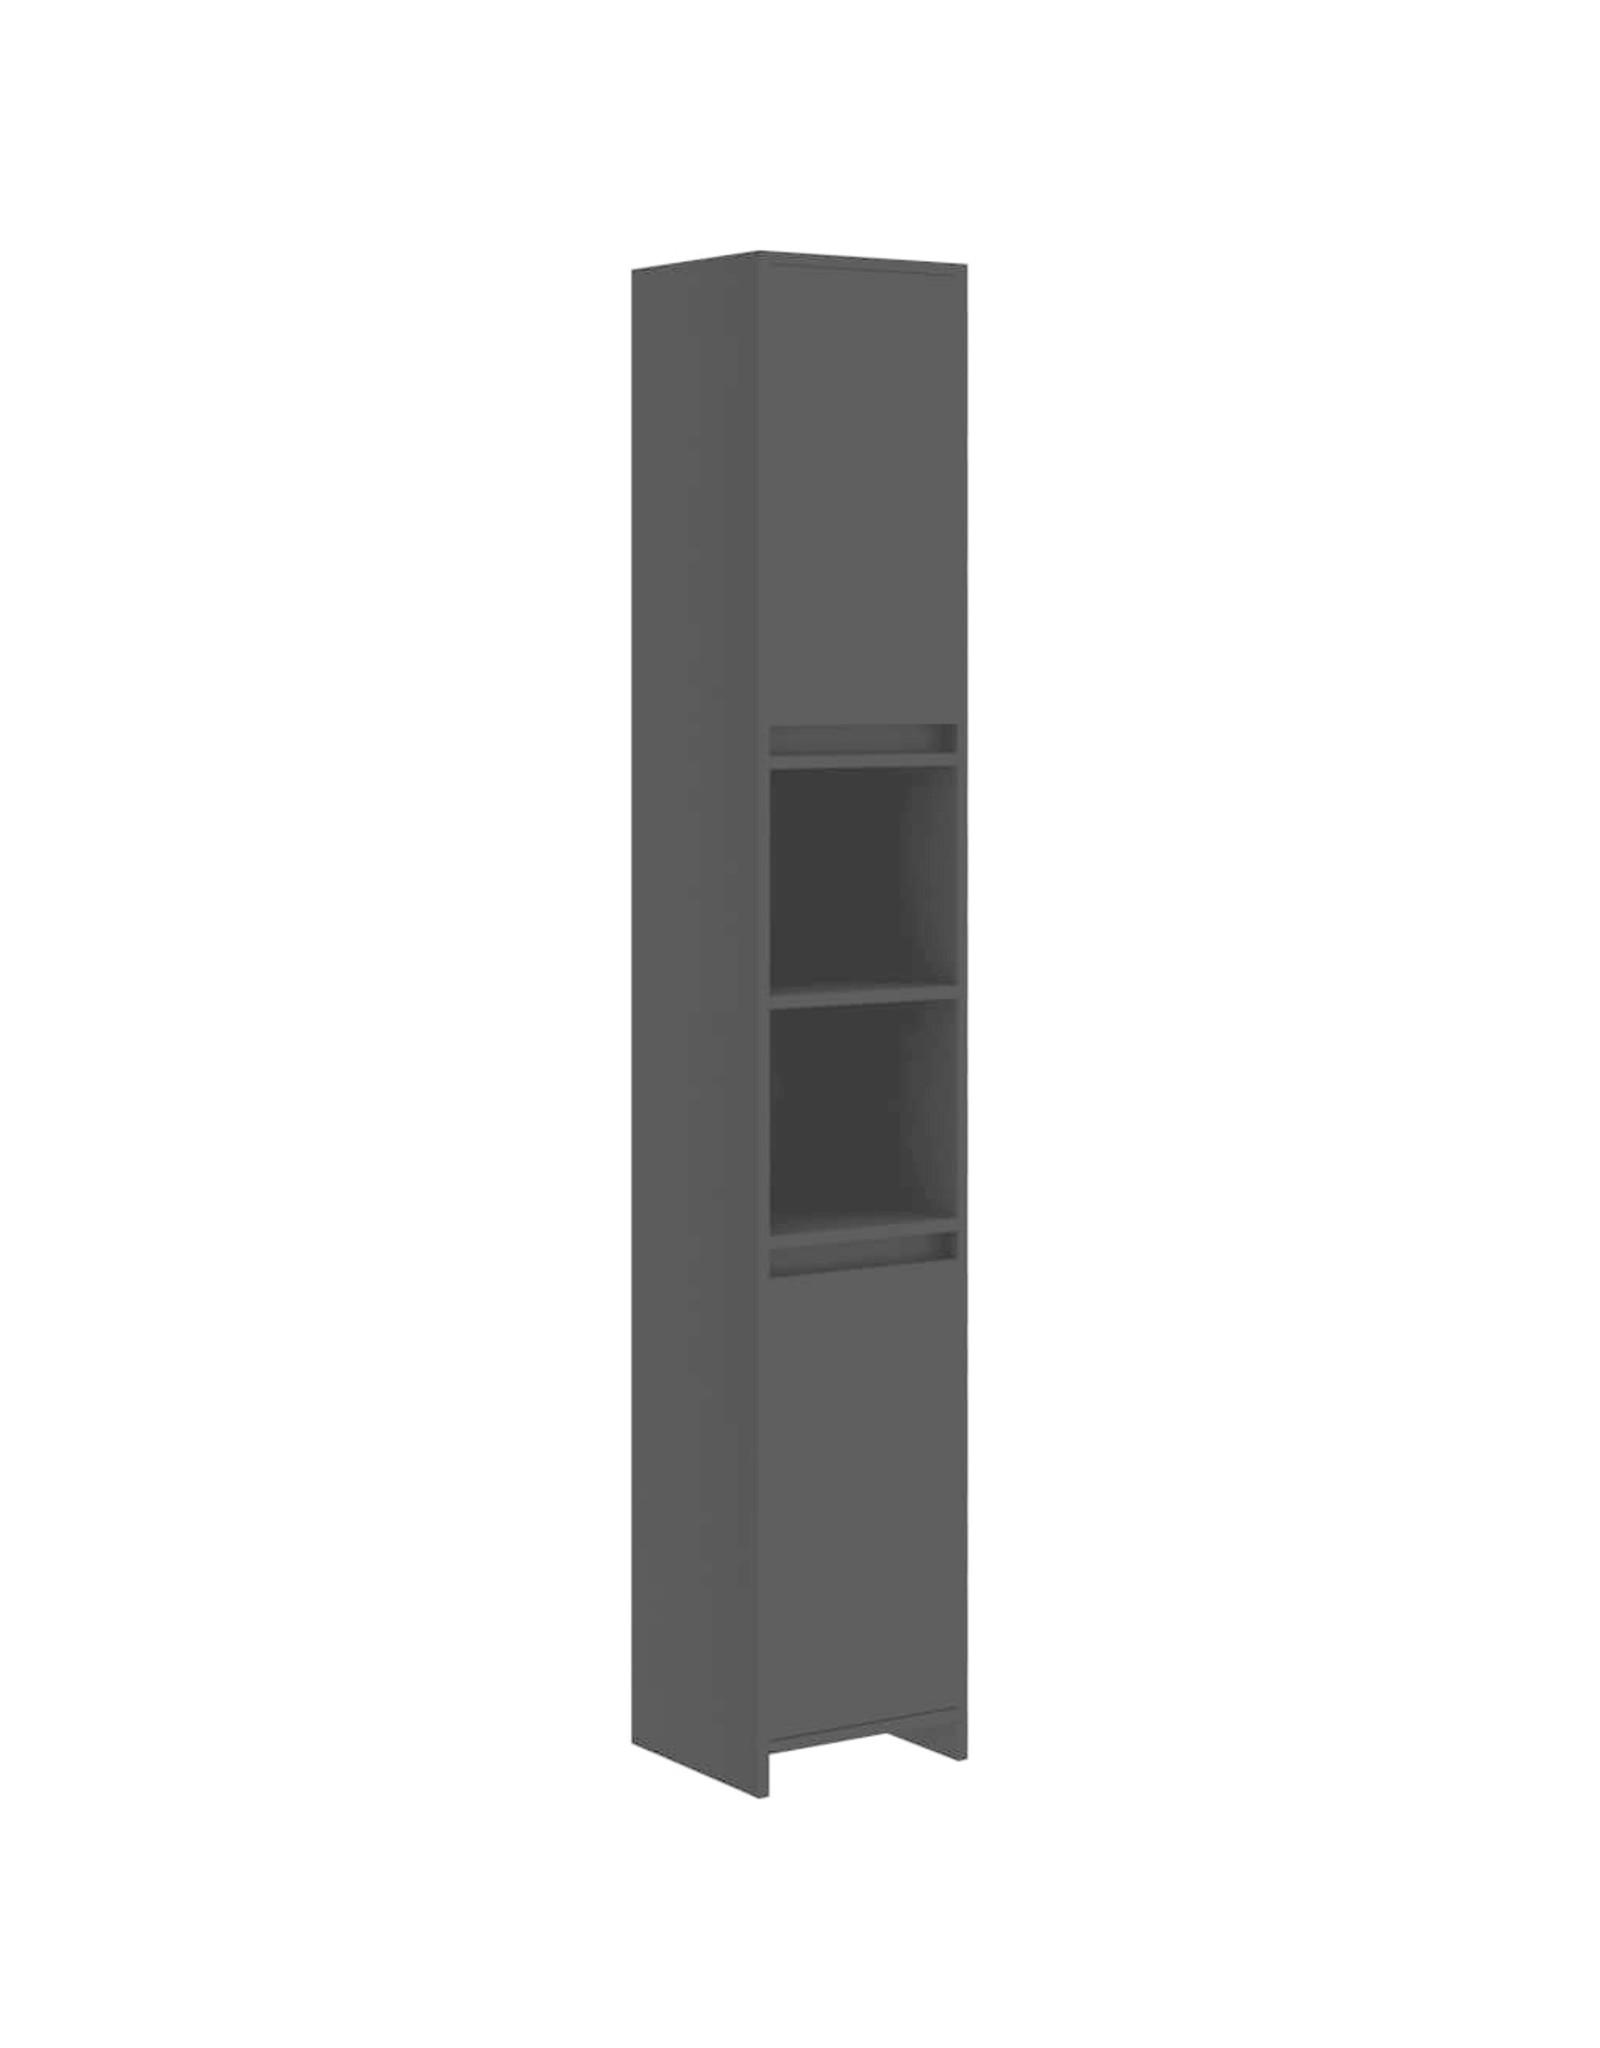 Badkamerkast 30x30x183,5 cm spaanplaat zwart